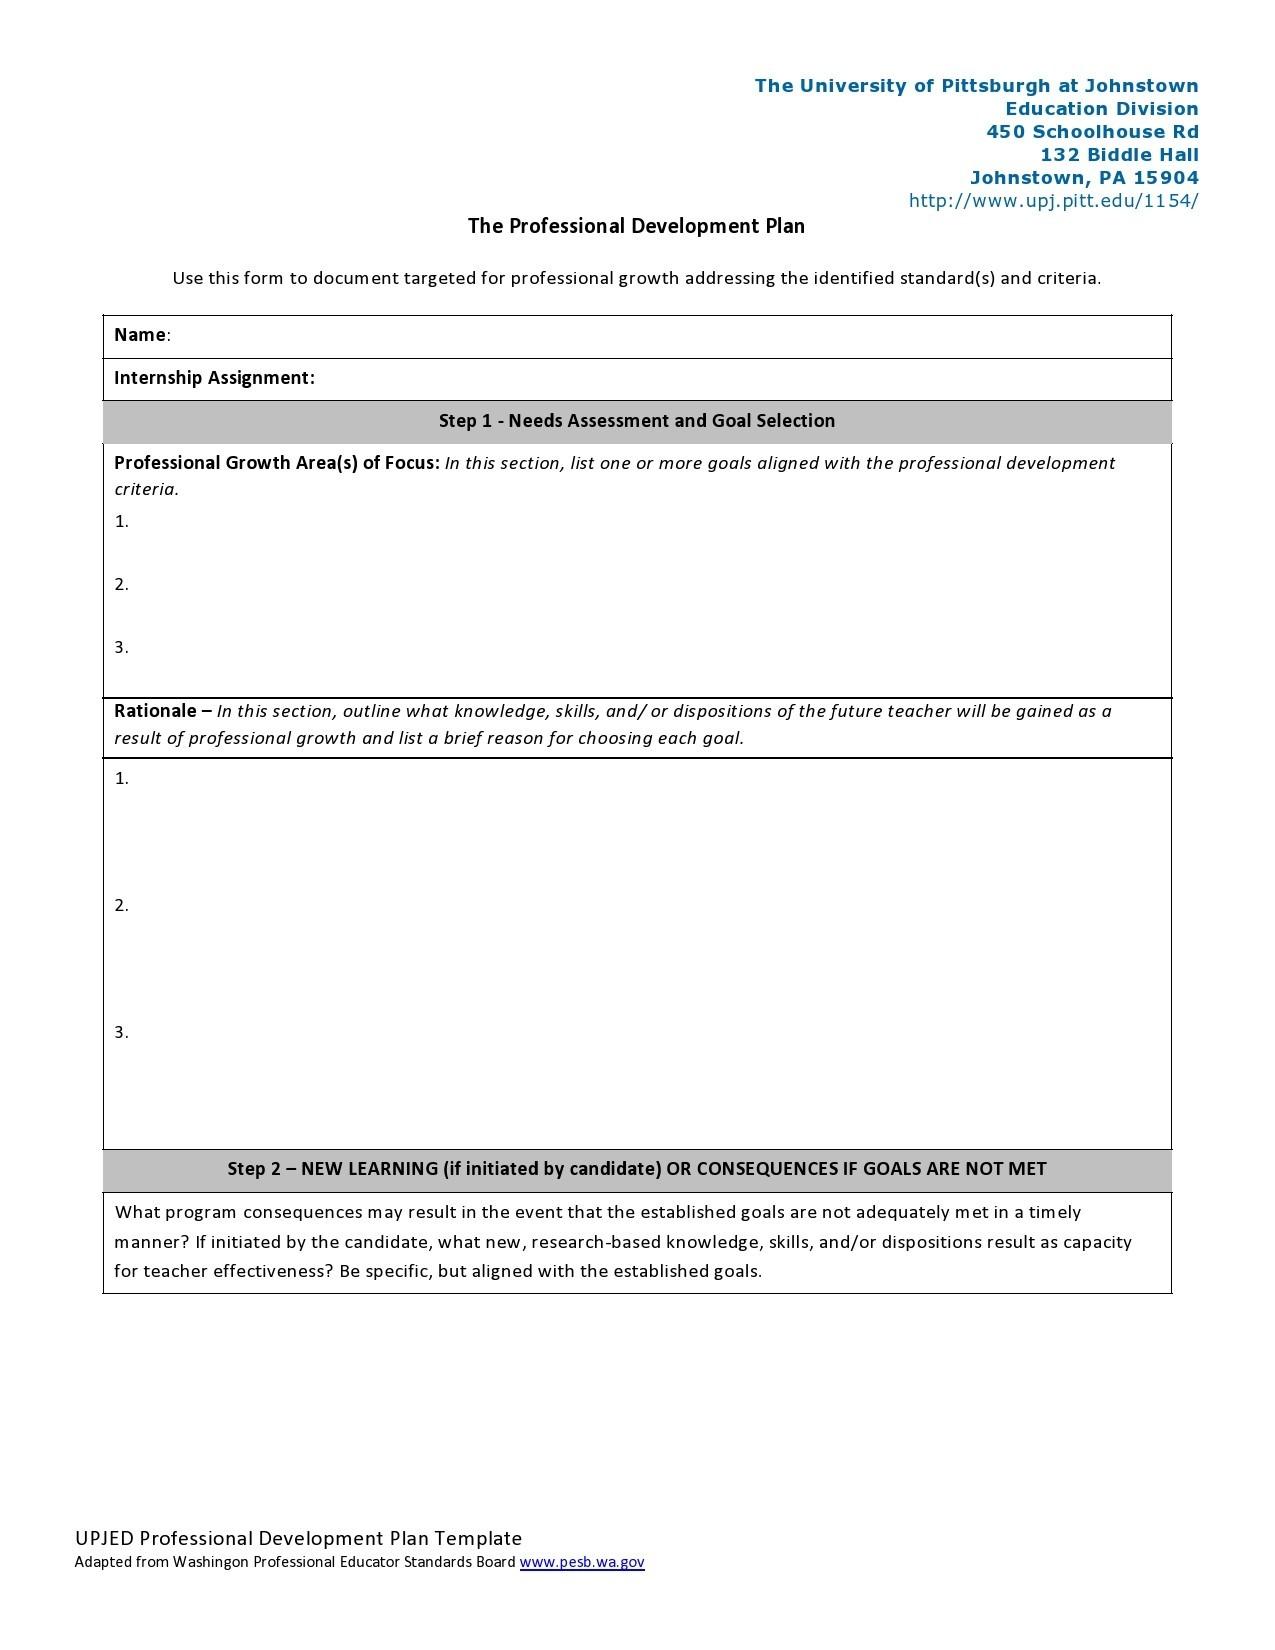 Free professional development plan 09